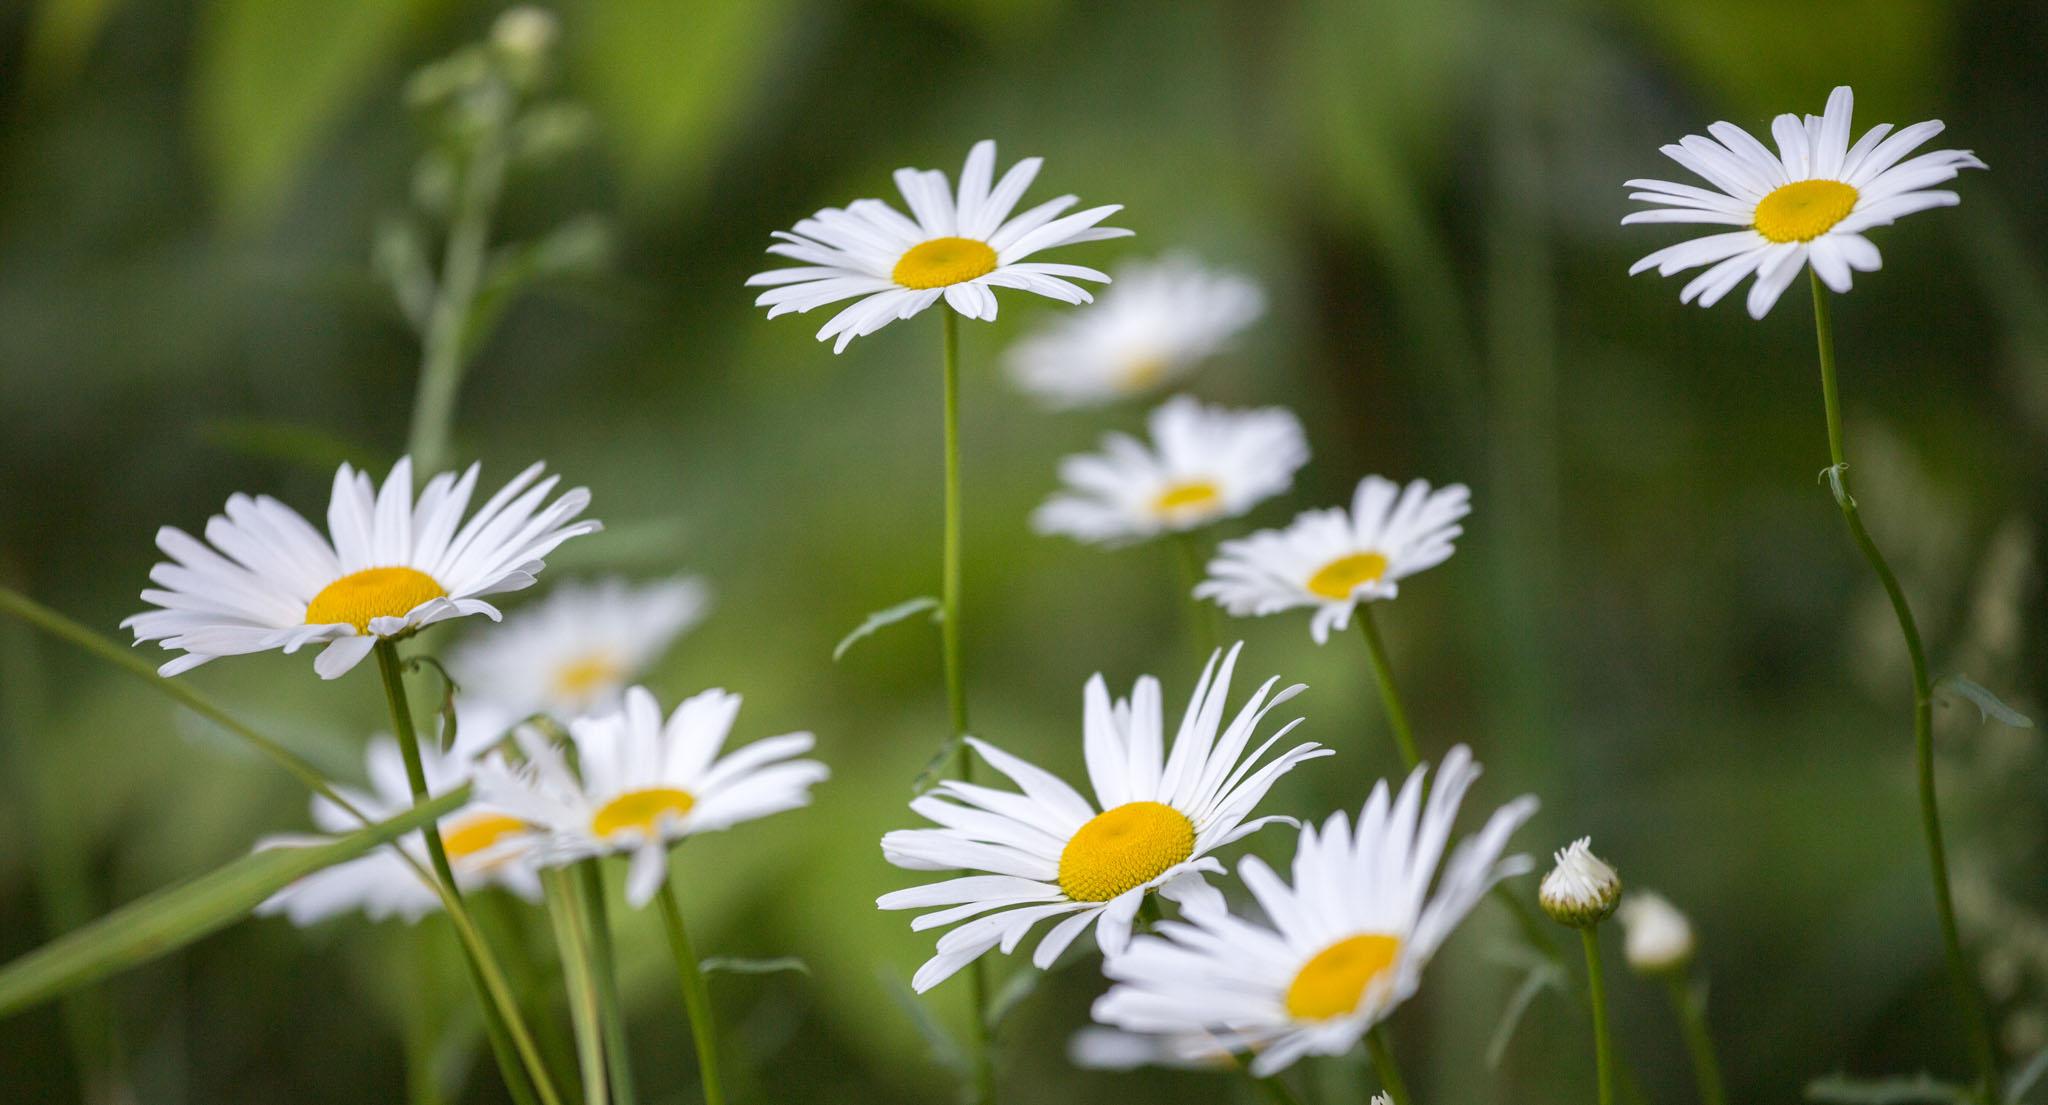 daisies wide 2k